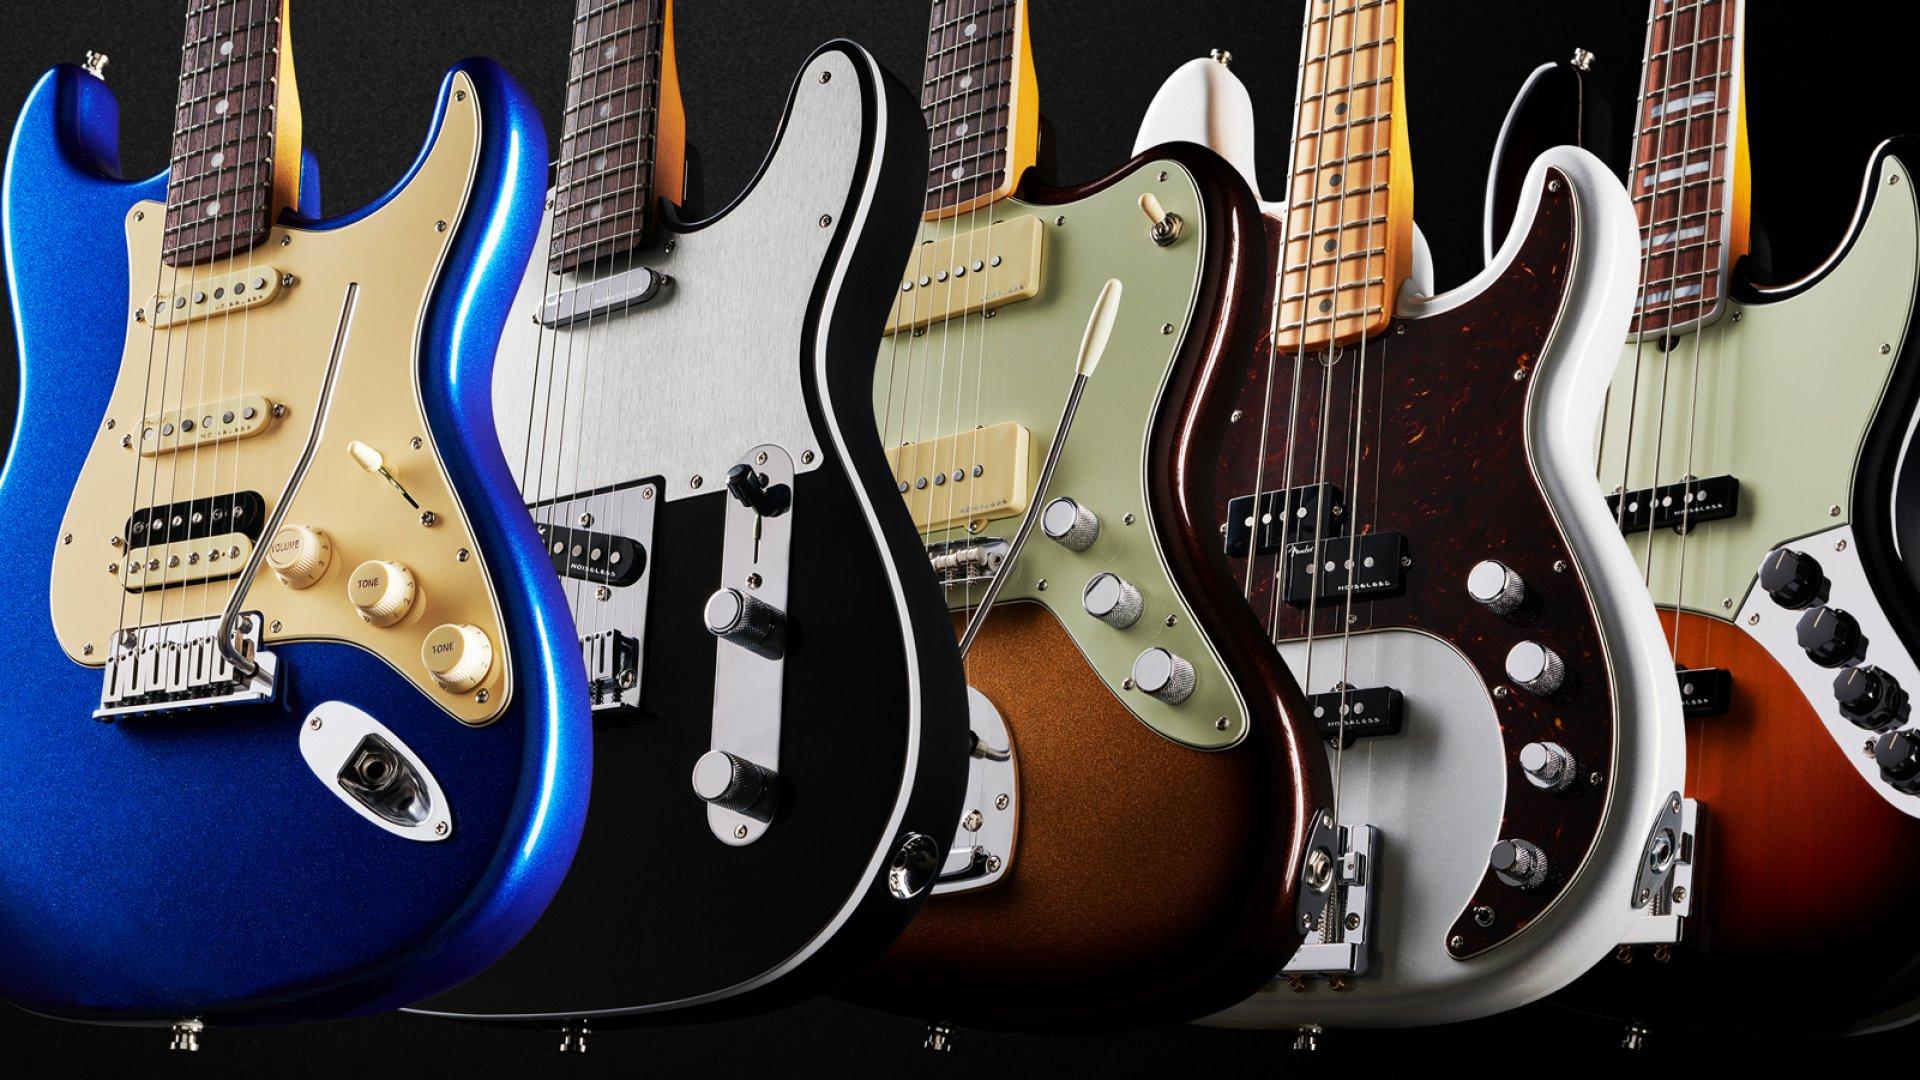 How Do You Evolve a Legacy Brand Like Fender? Subtly.